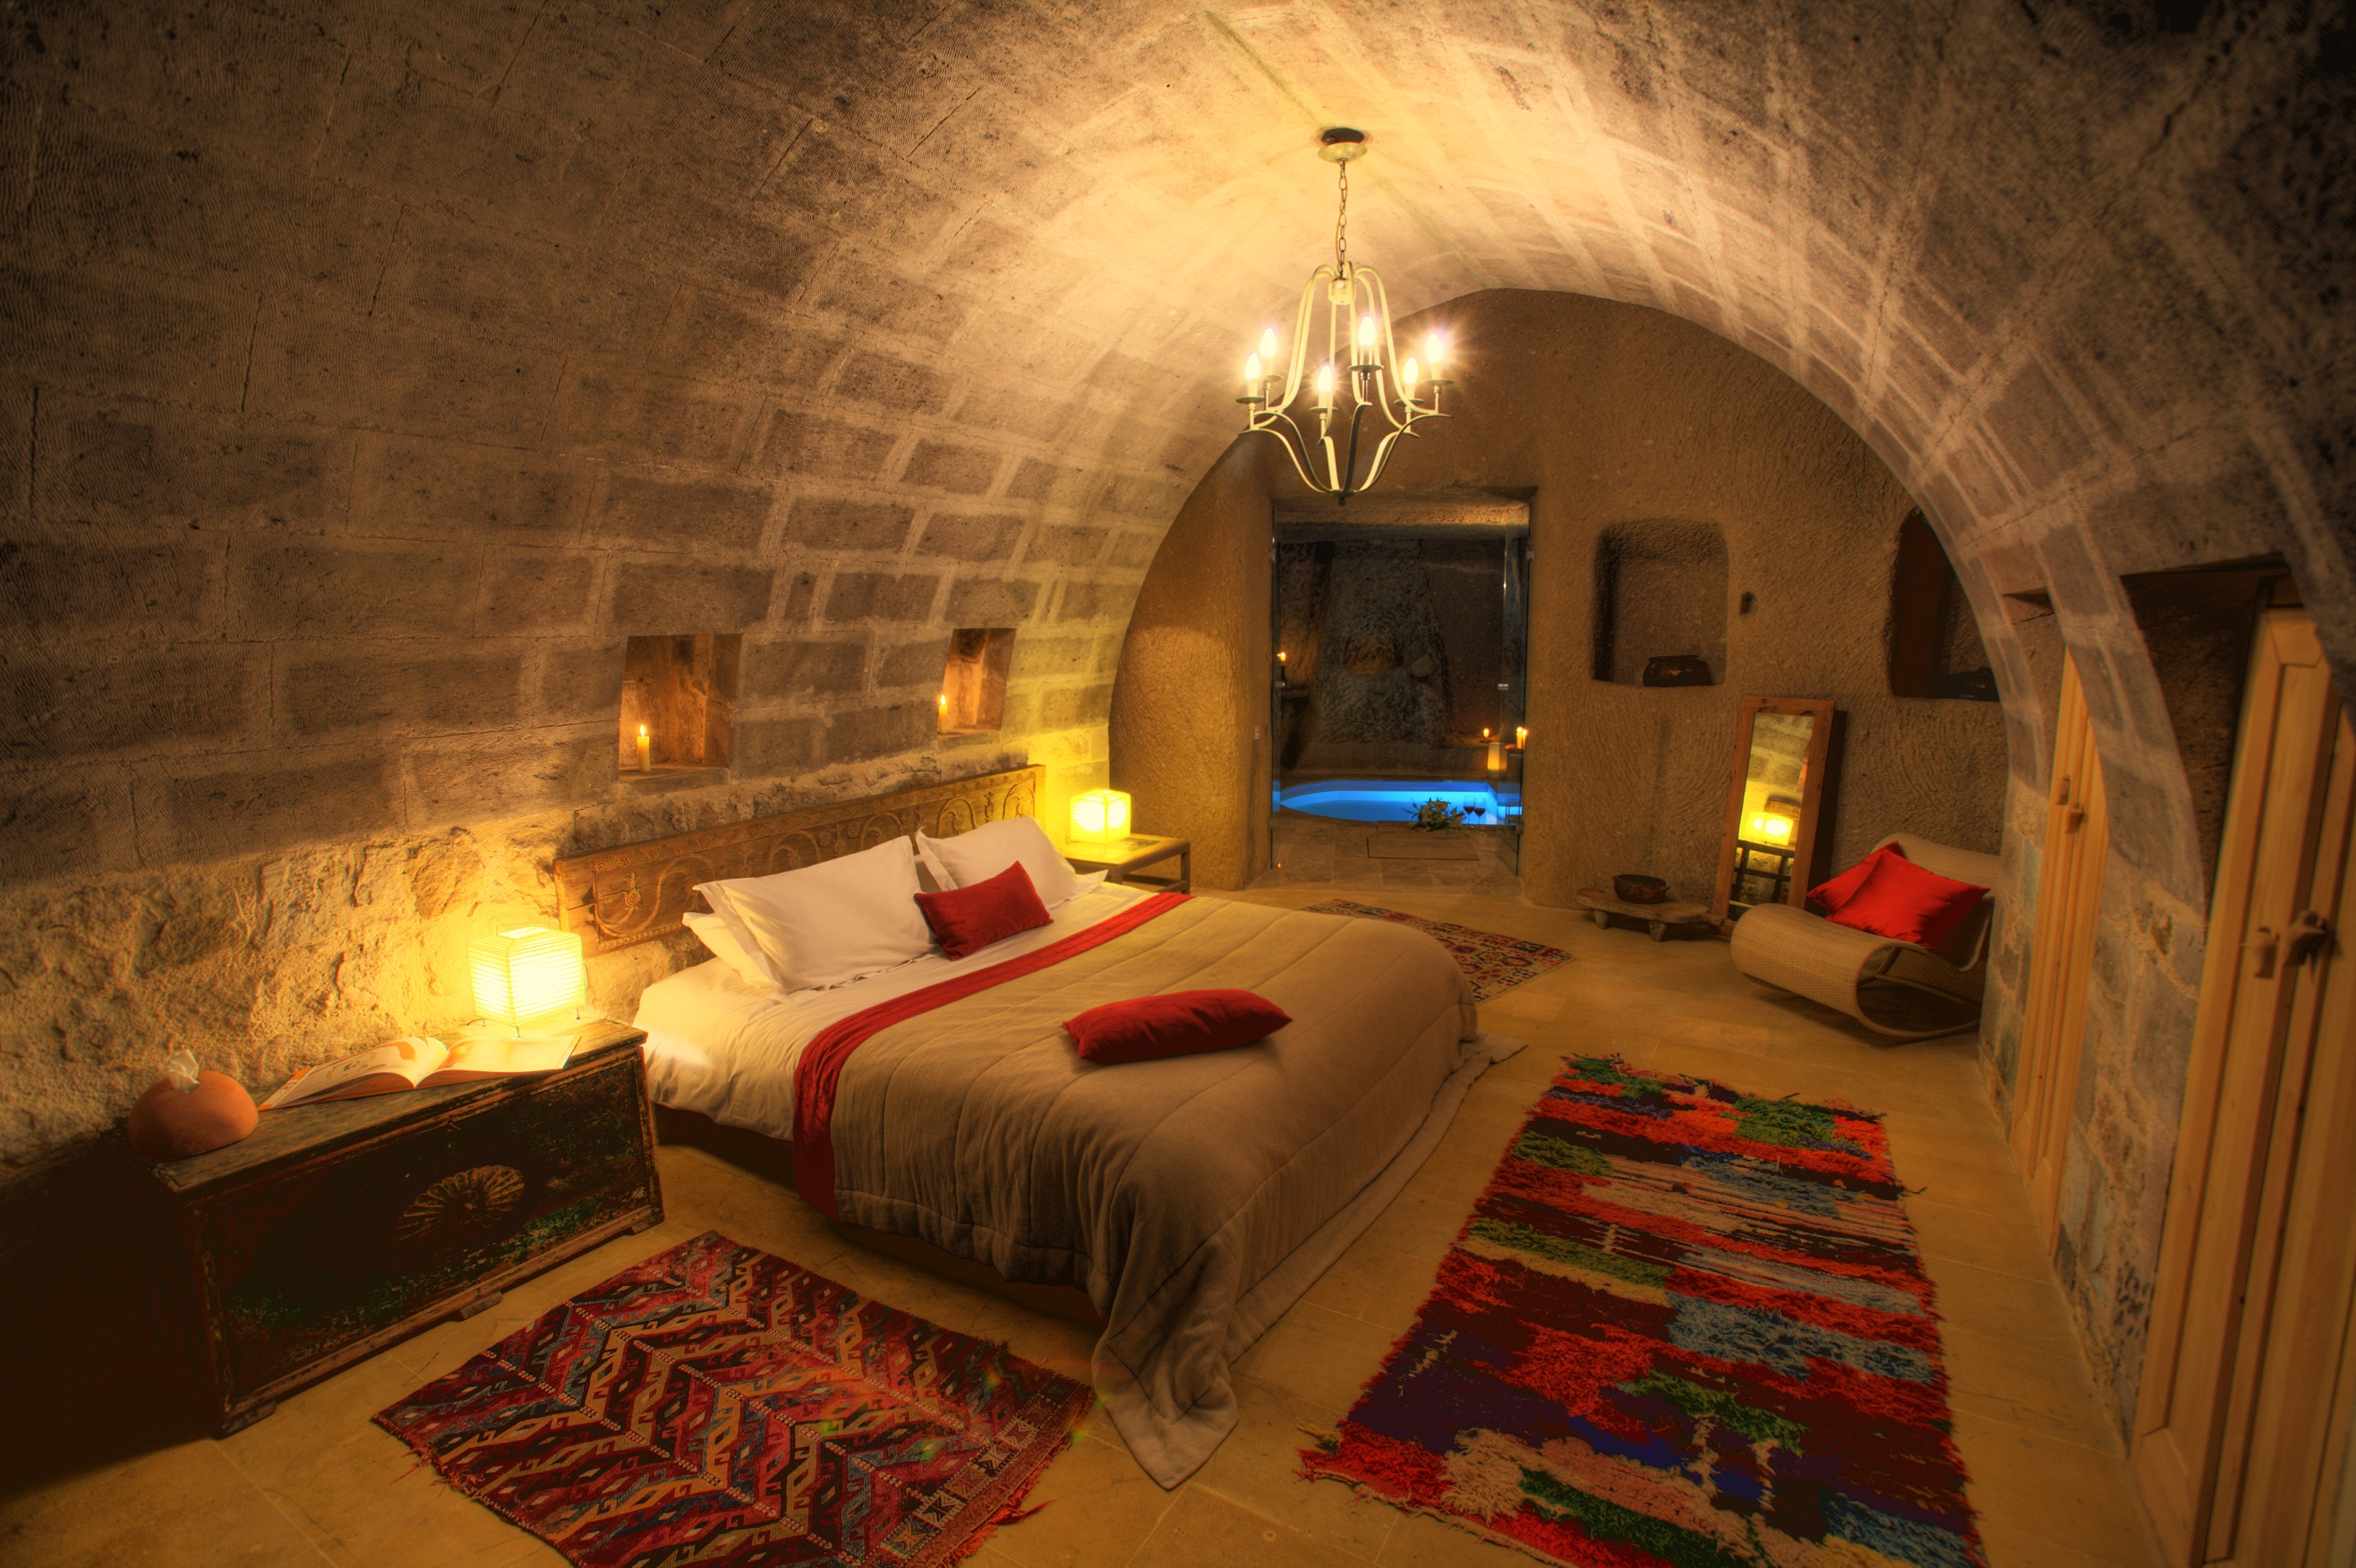 Dream Cave Hotel, Cappadocia, Turkey 2